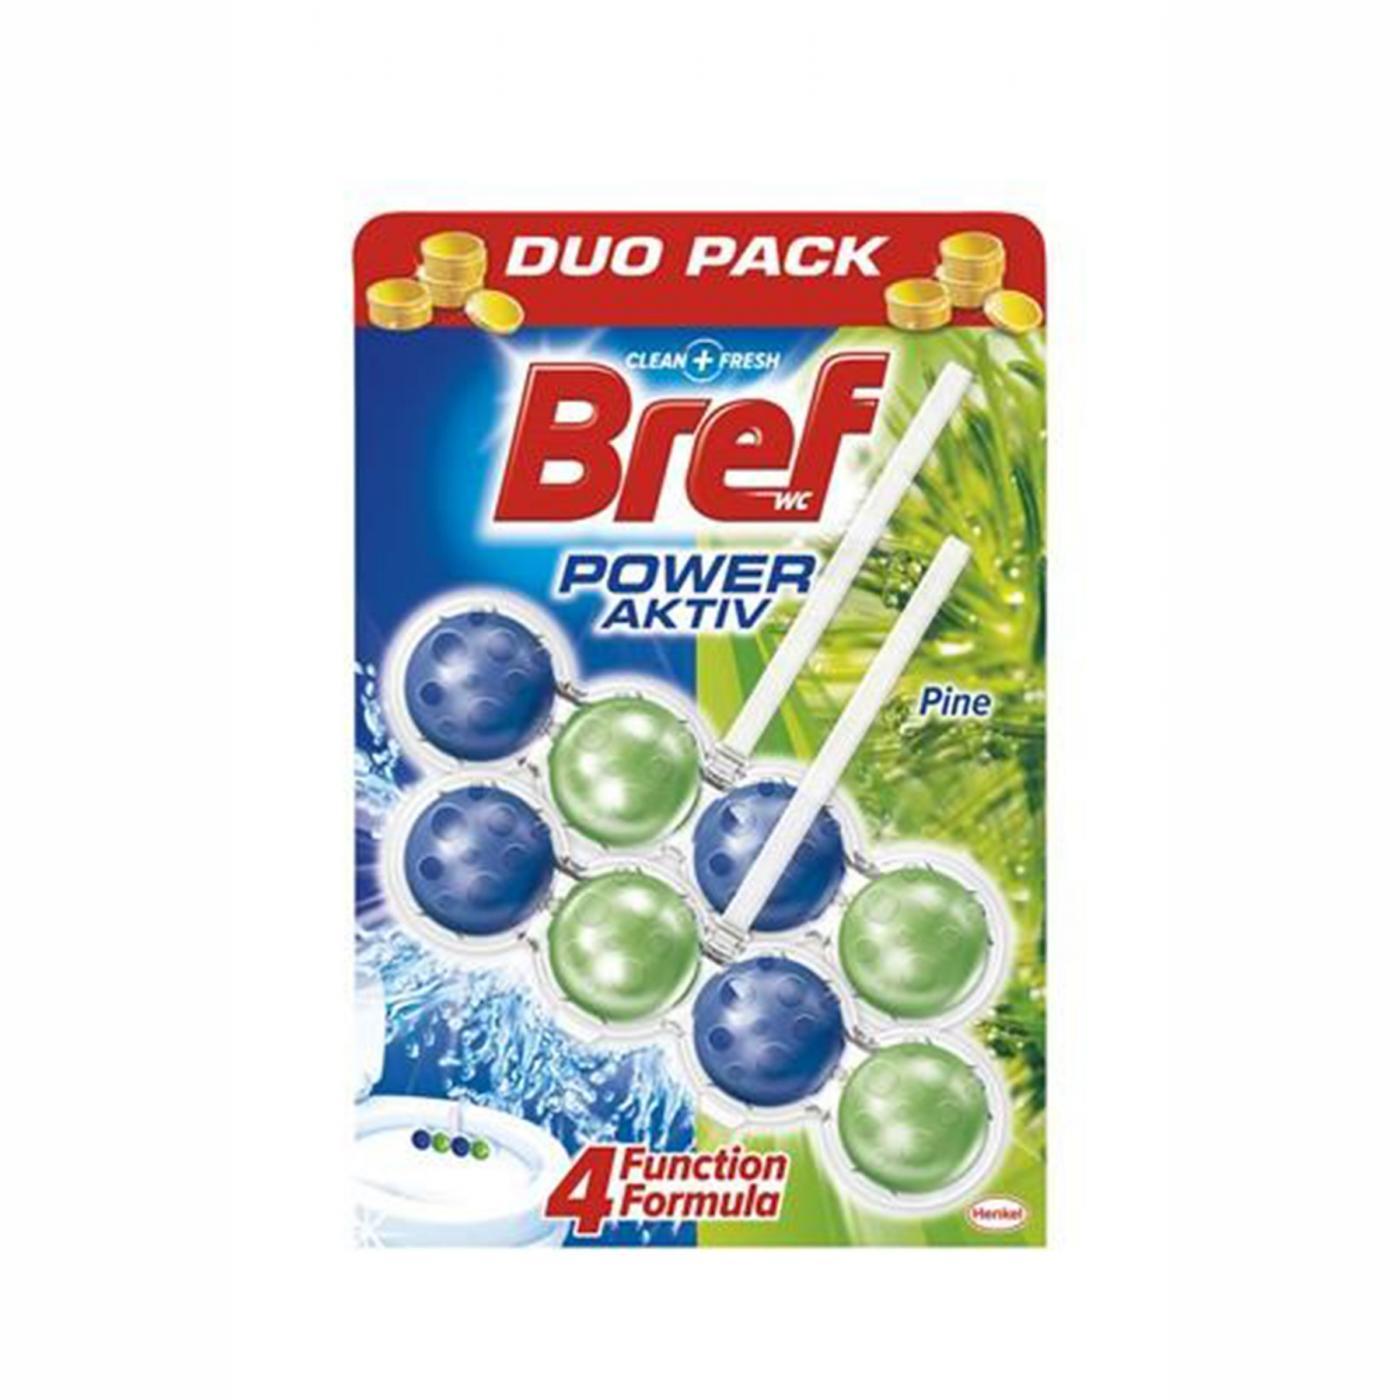 BREF POWER AKTİF 2*50GR DUO PACK 8Lİ ÇAM